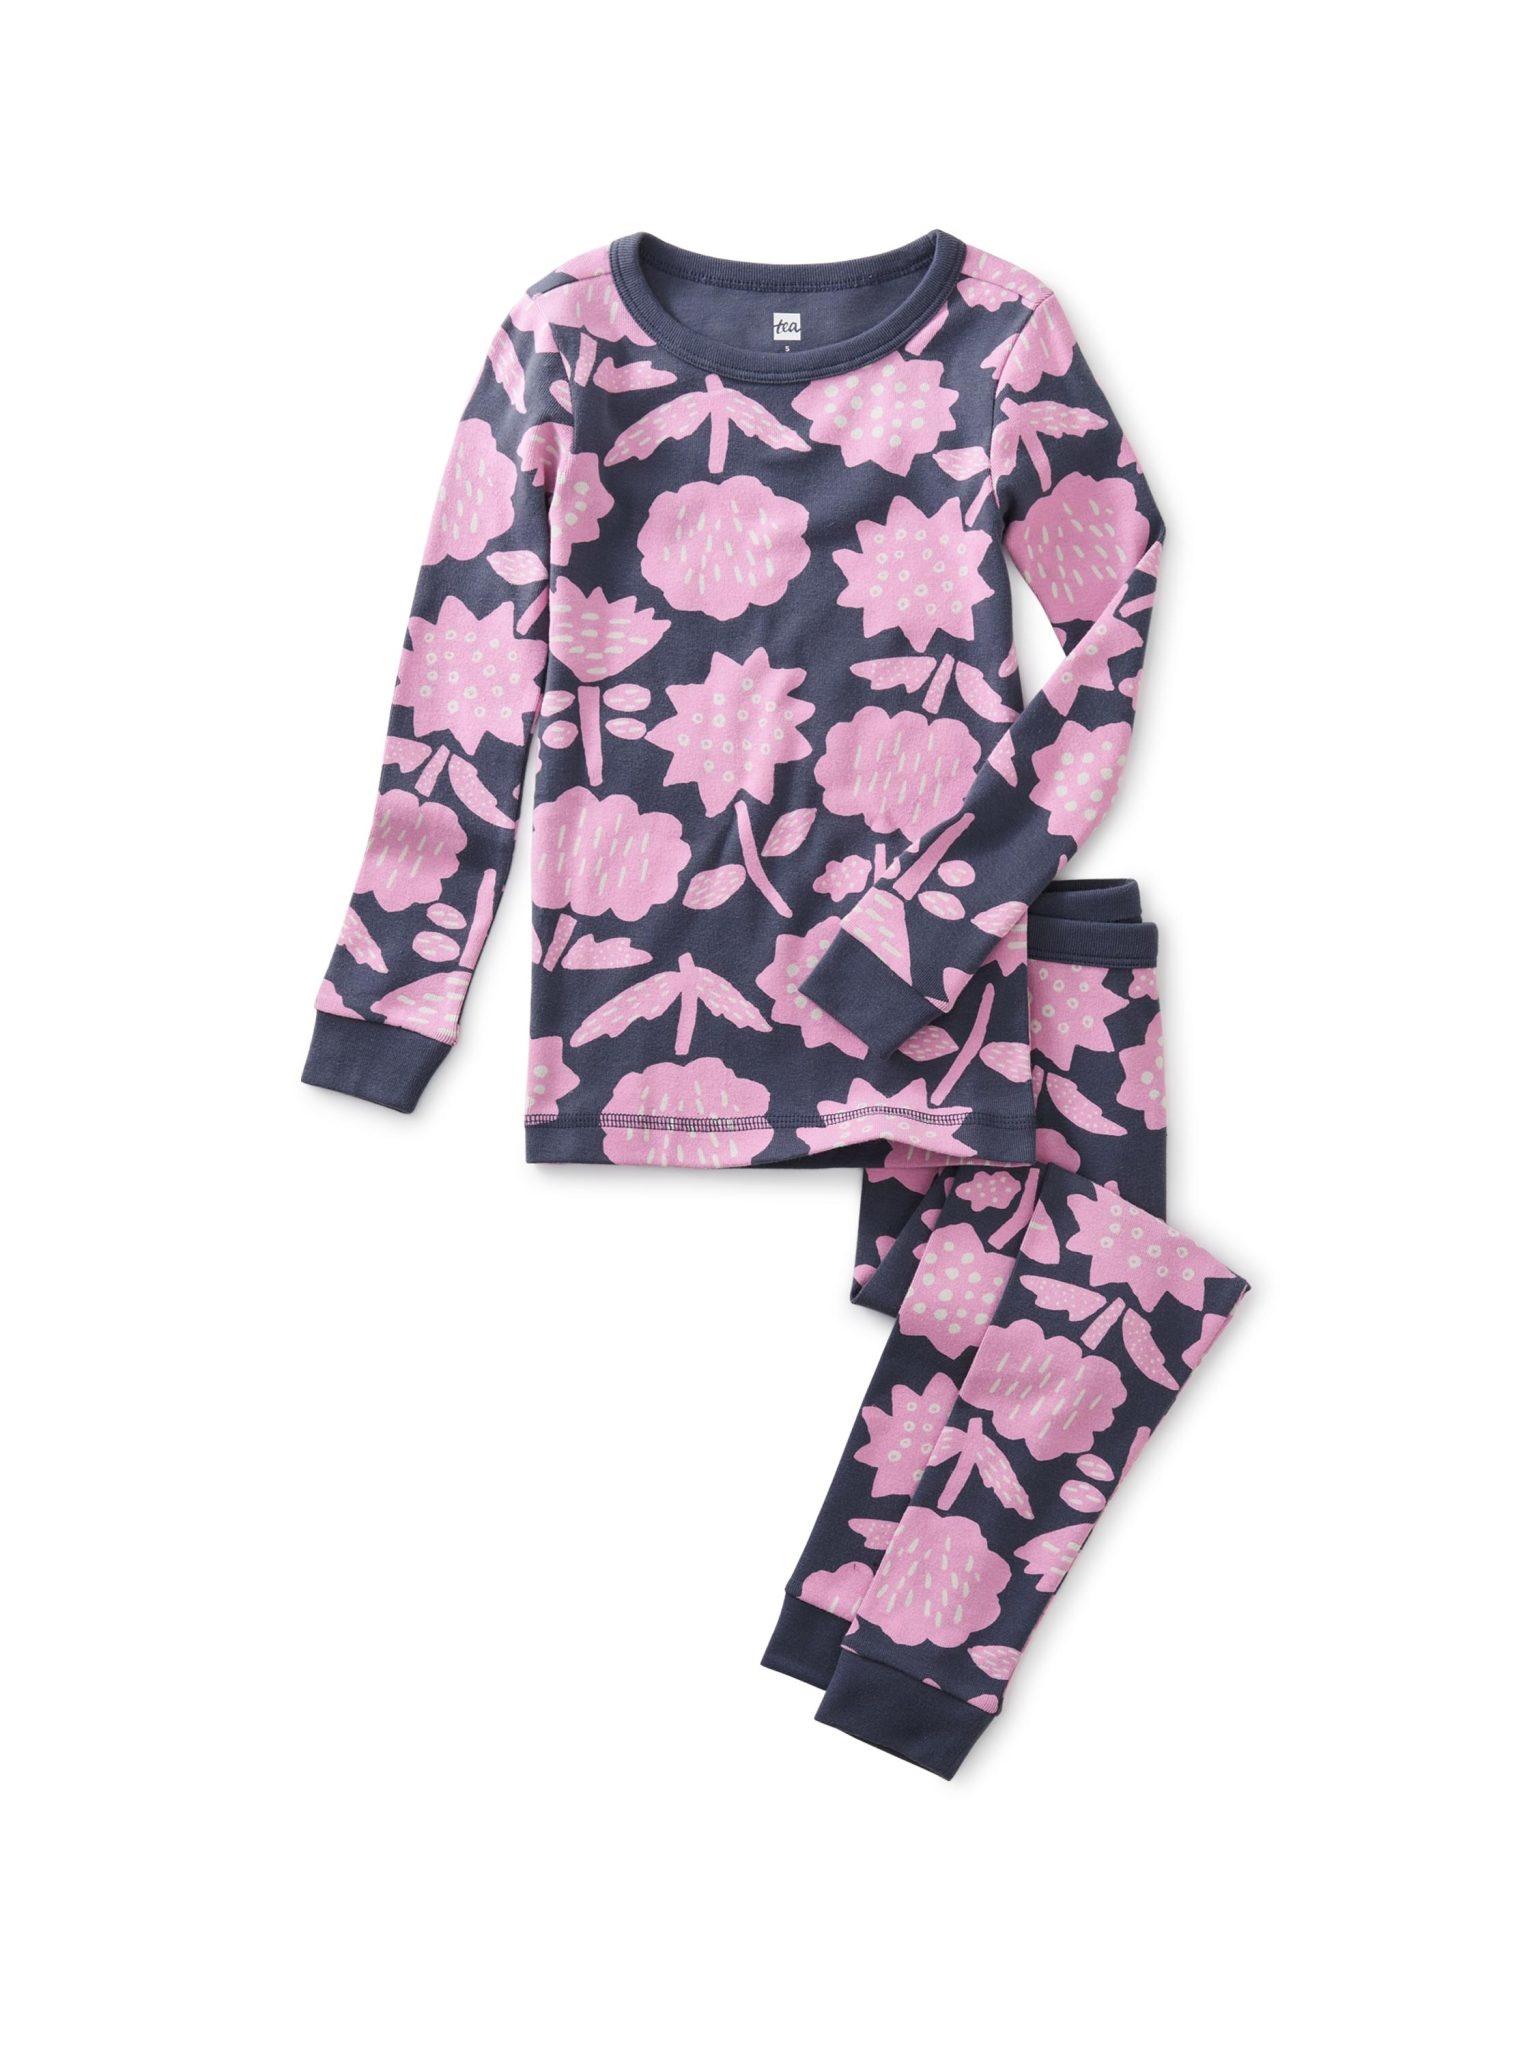 Tea Collection Awesome Blossoms Pajamas